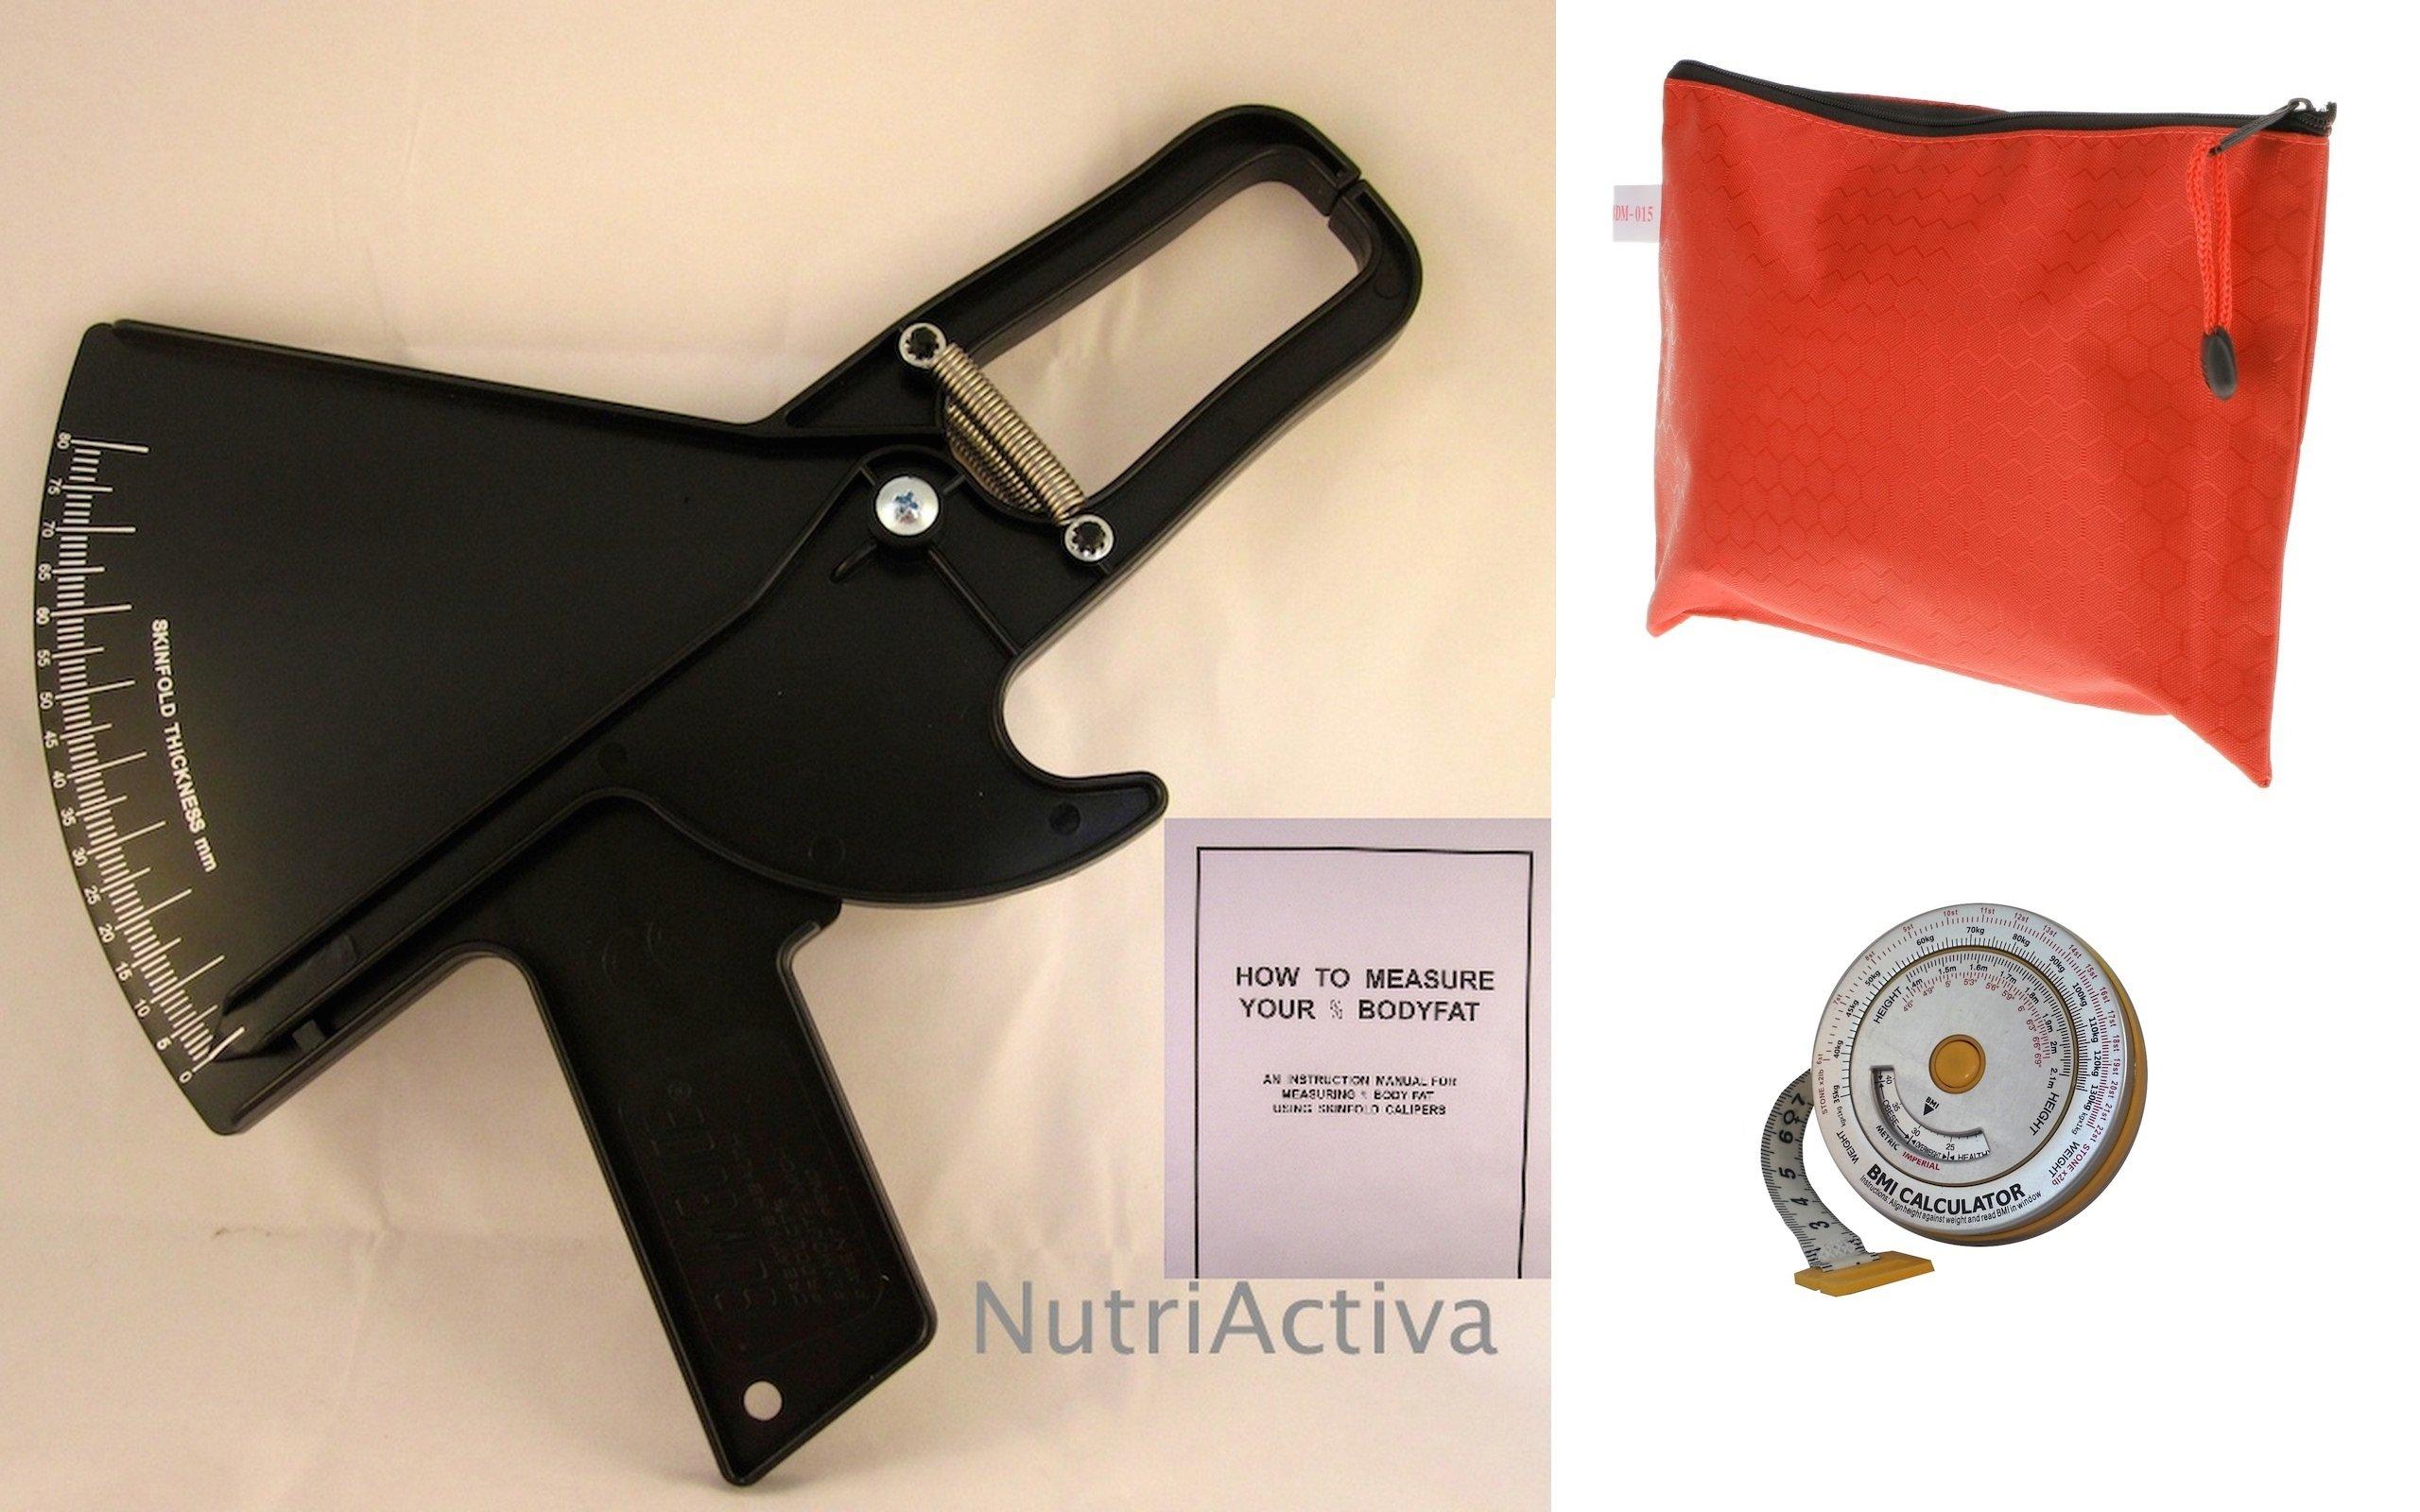 Slim Guide Skinfold Caliper Kit w/ Case, BMI Tape Measure, Transport Bag (Black)